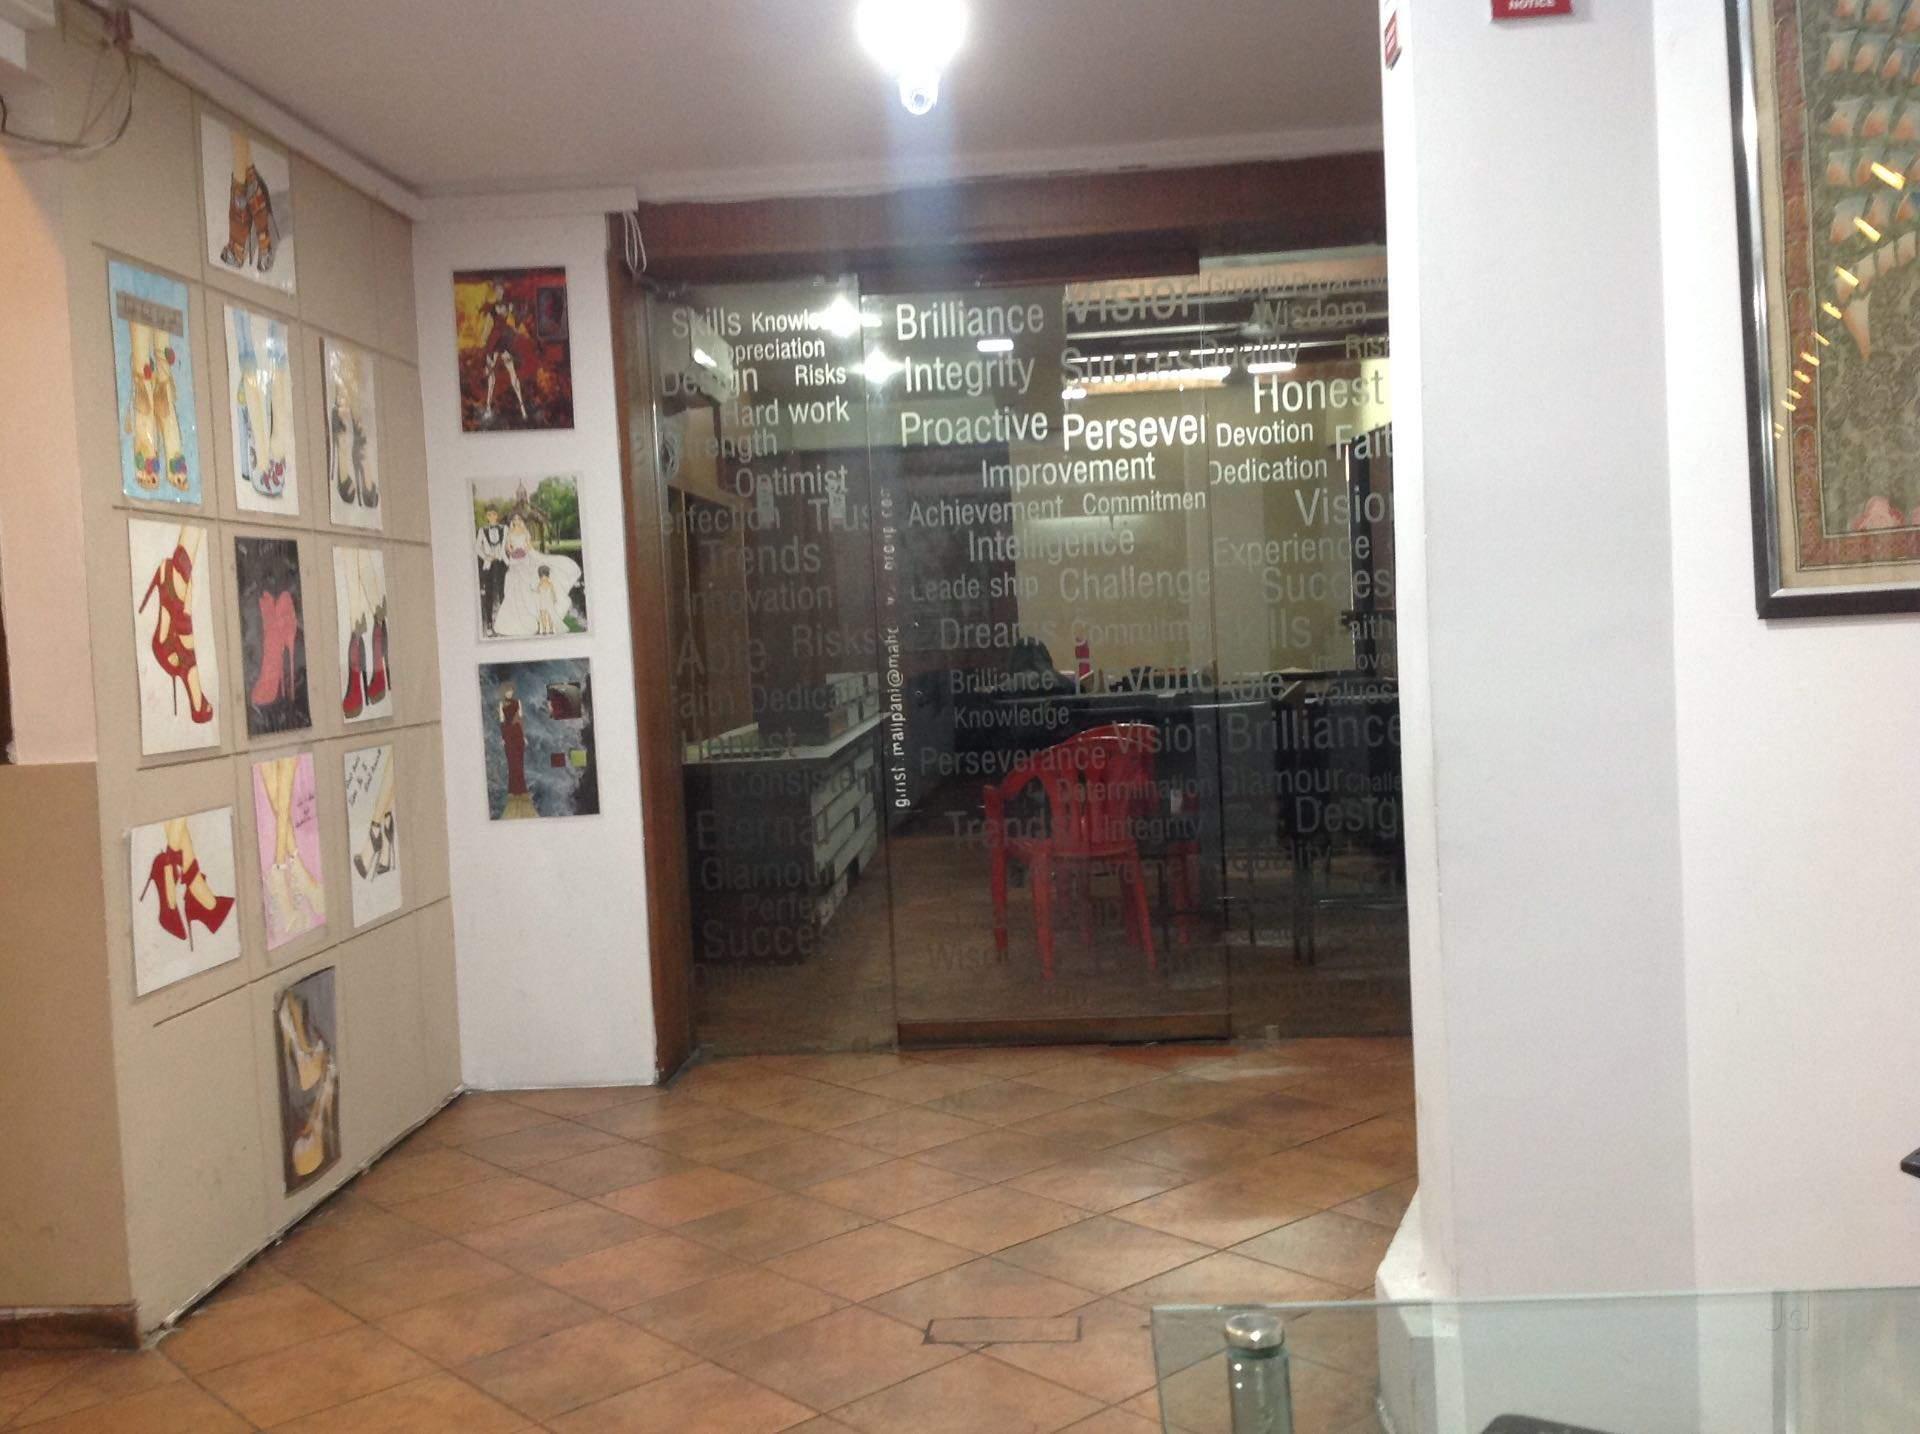 Lakhotia Institute Of Design Tarnaka Fashion Designing Institutes In Hyderabad Justdial